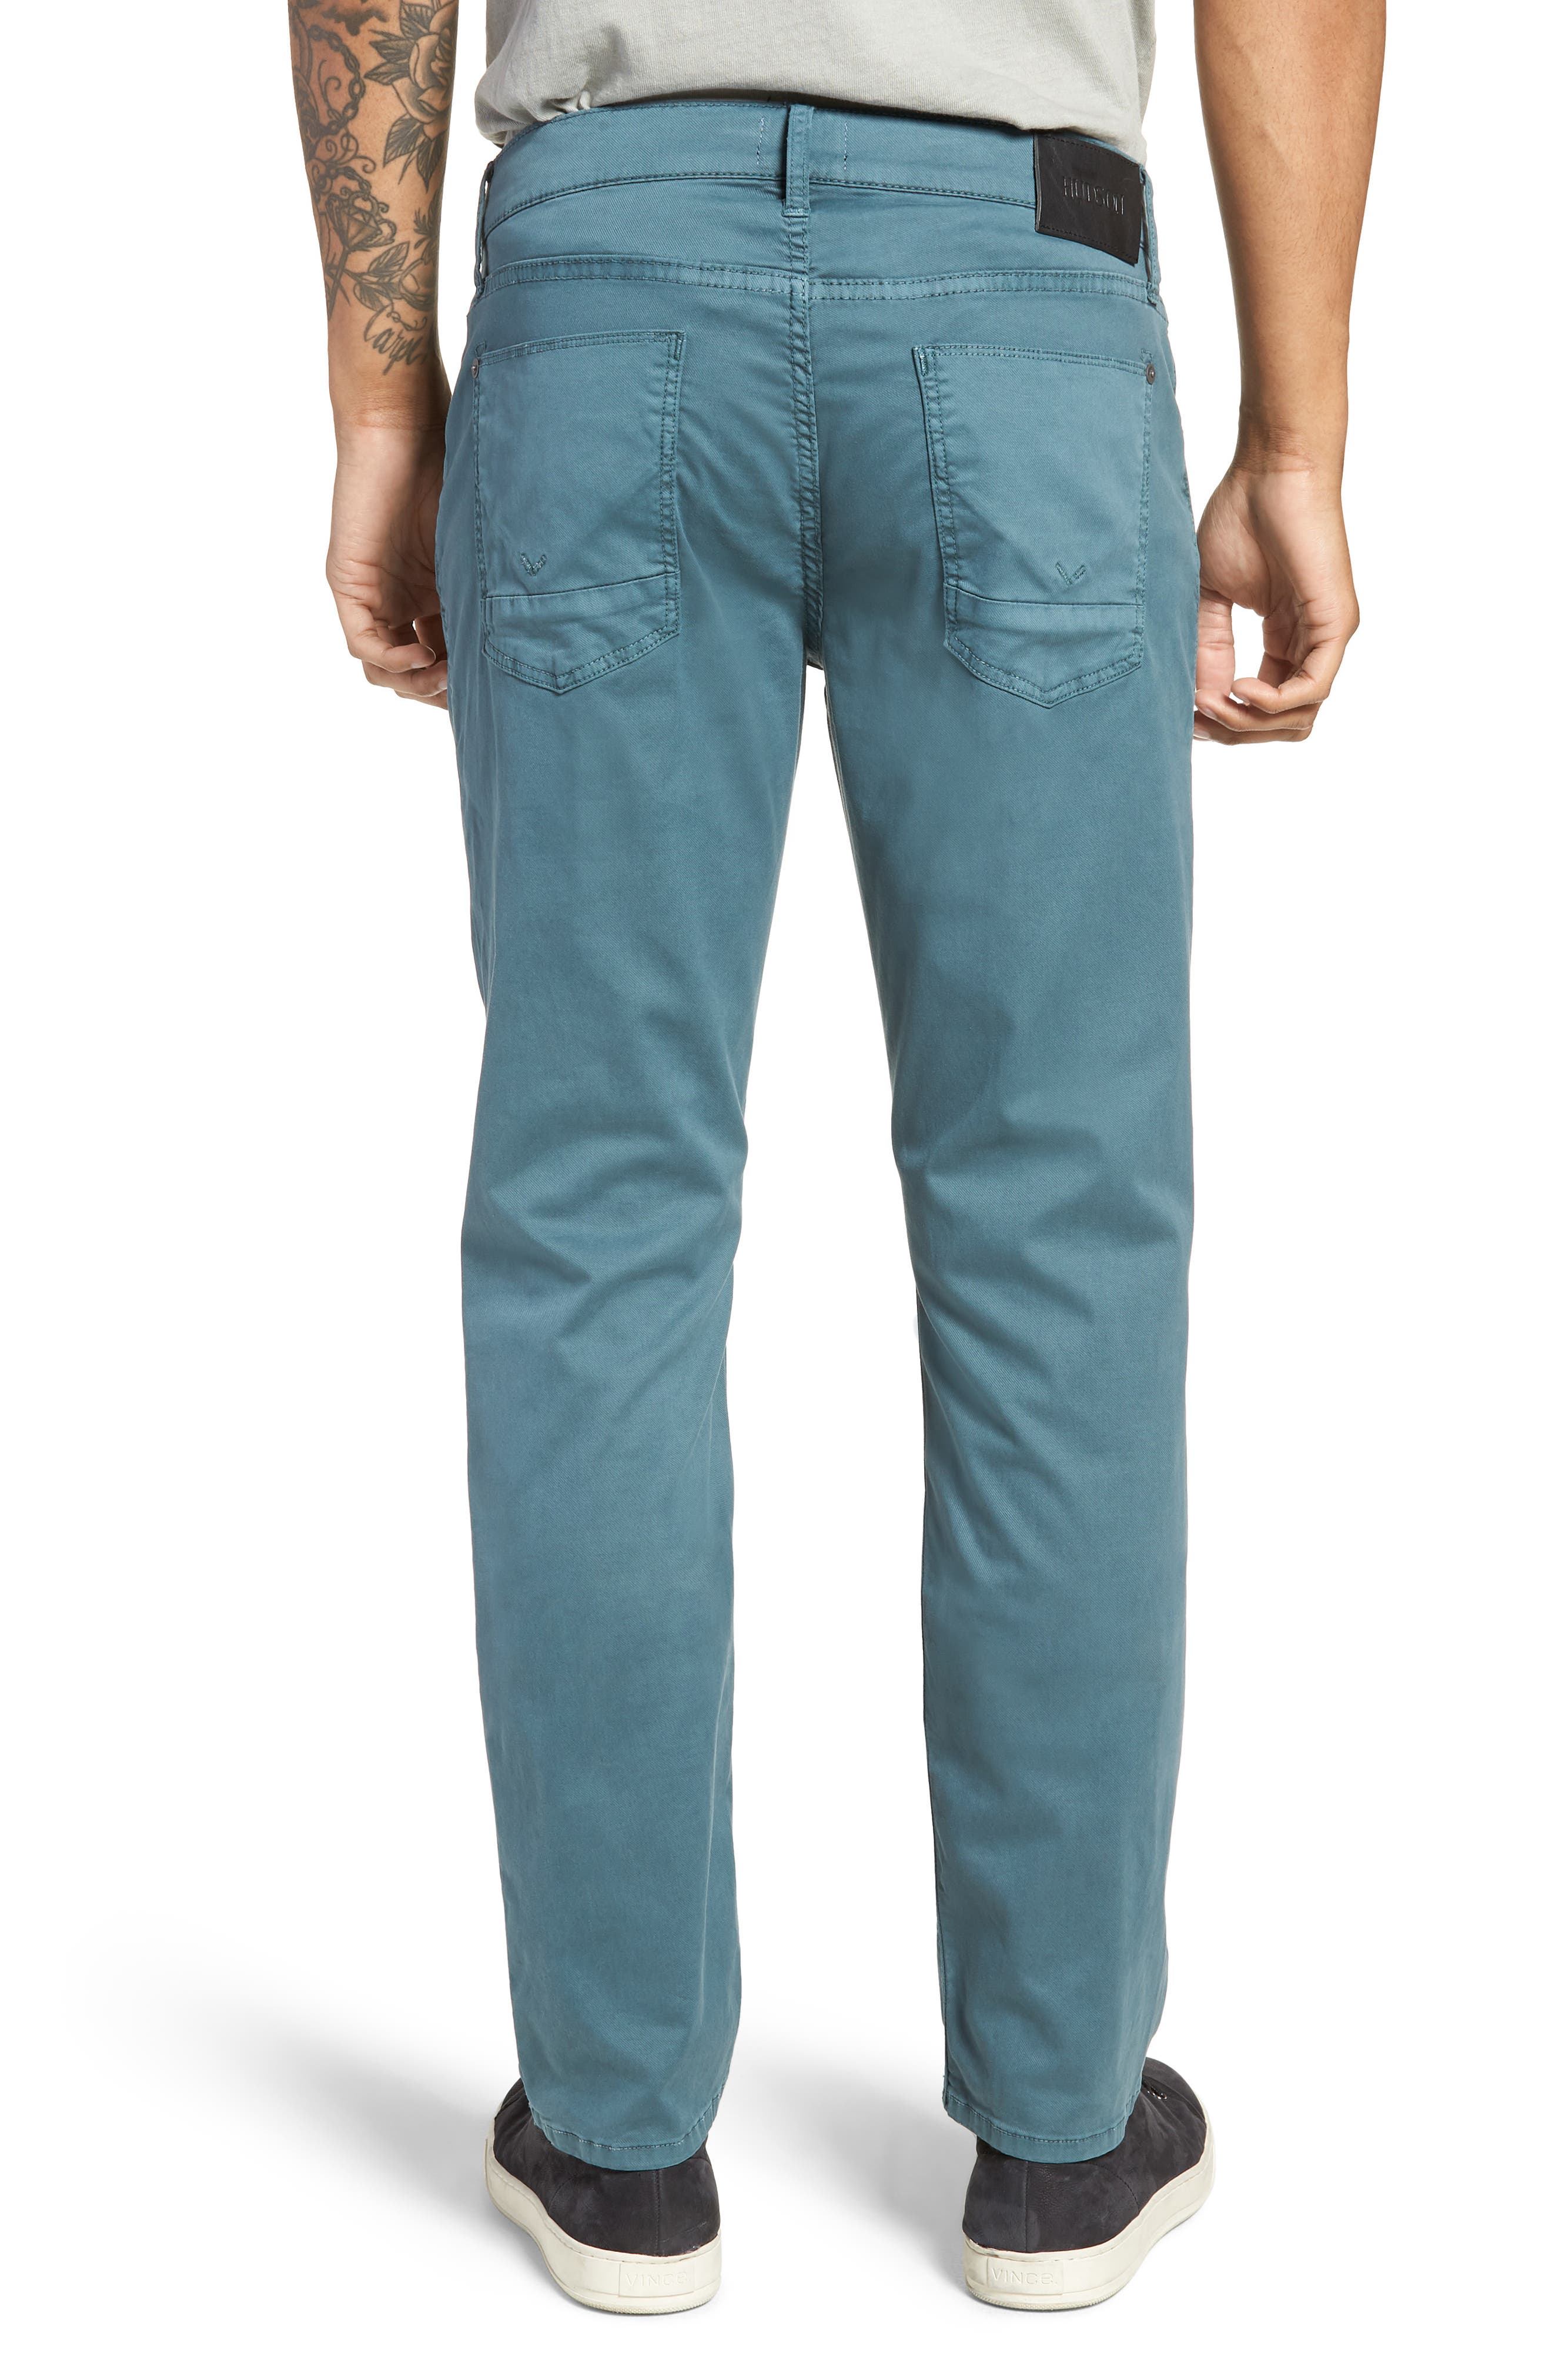 Blake Slim Fit Jeans,                             Alternate thumbnail 2, color,                             497